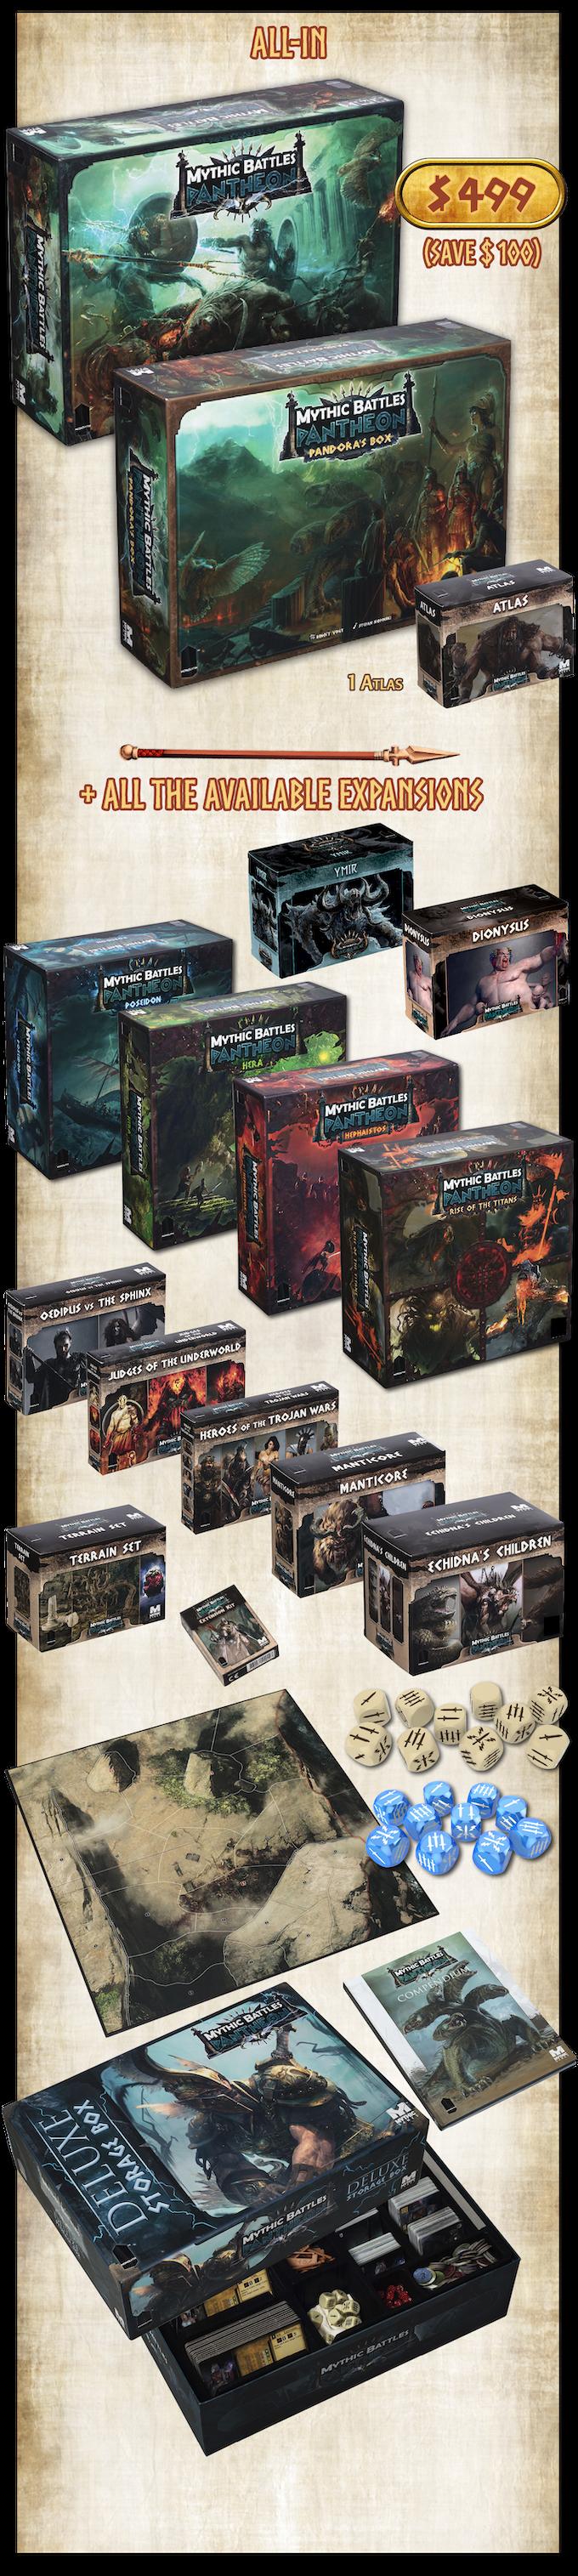 Mythic Battles: Pantheon 1 5 by Monolith Board Games LLC